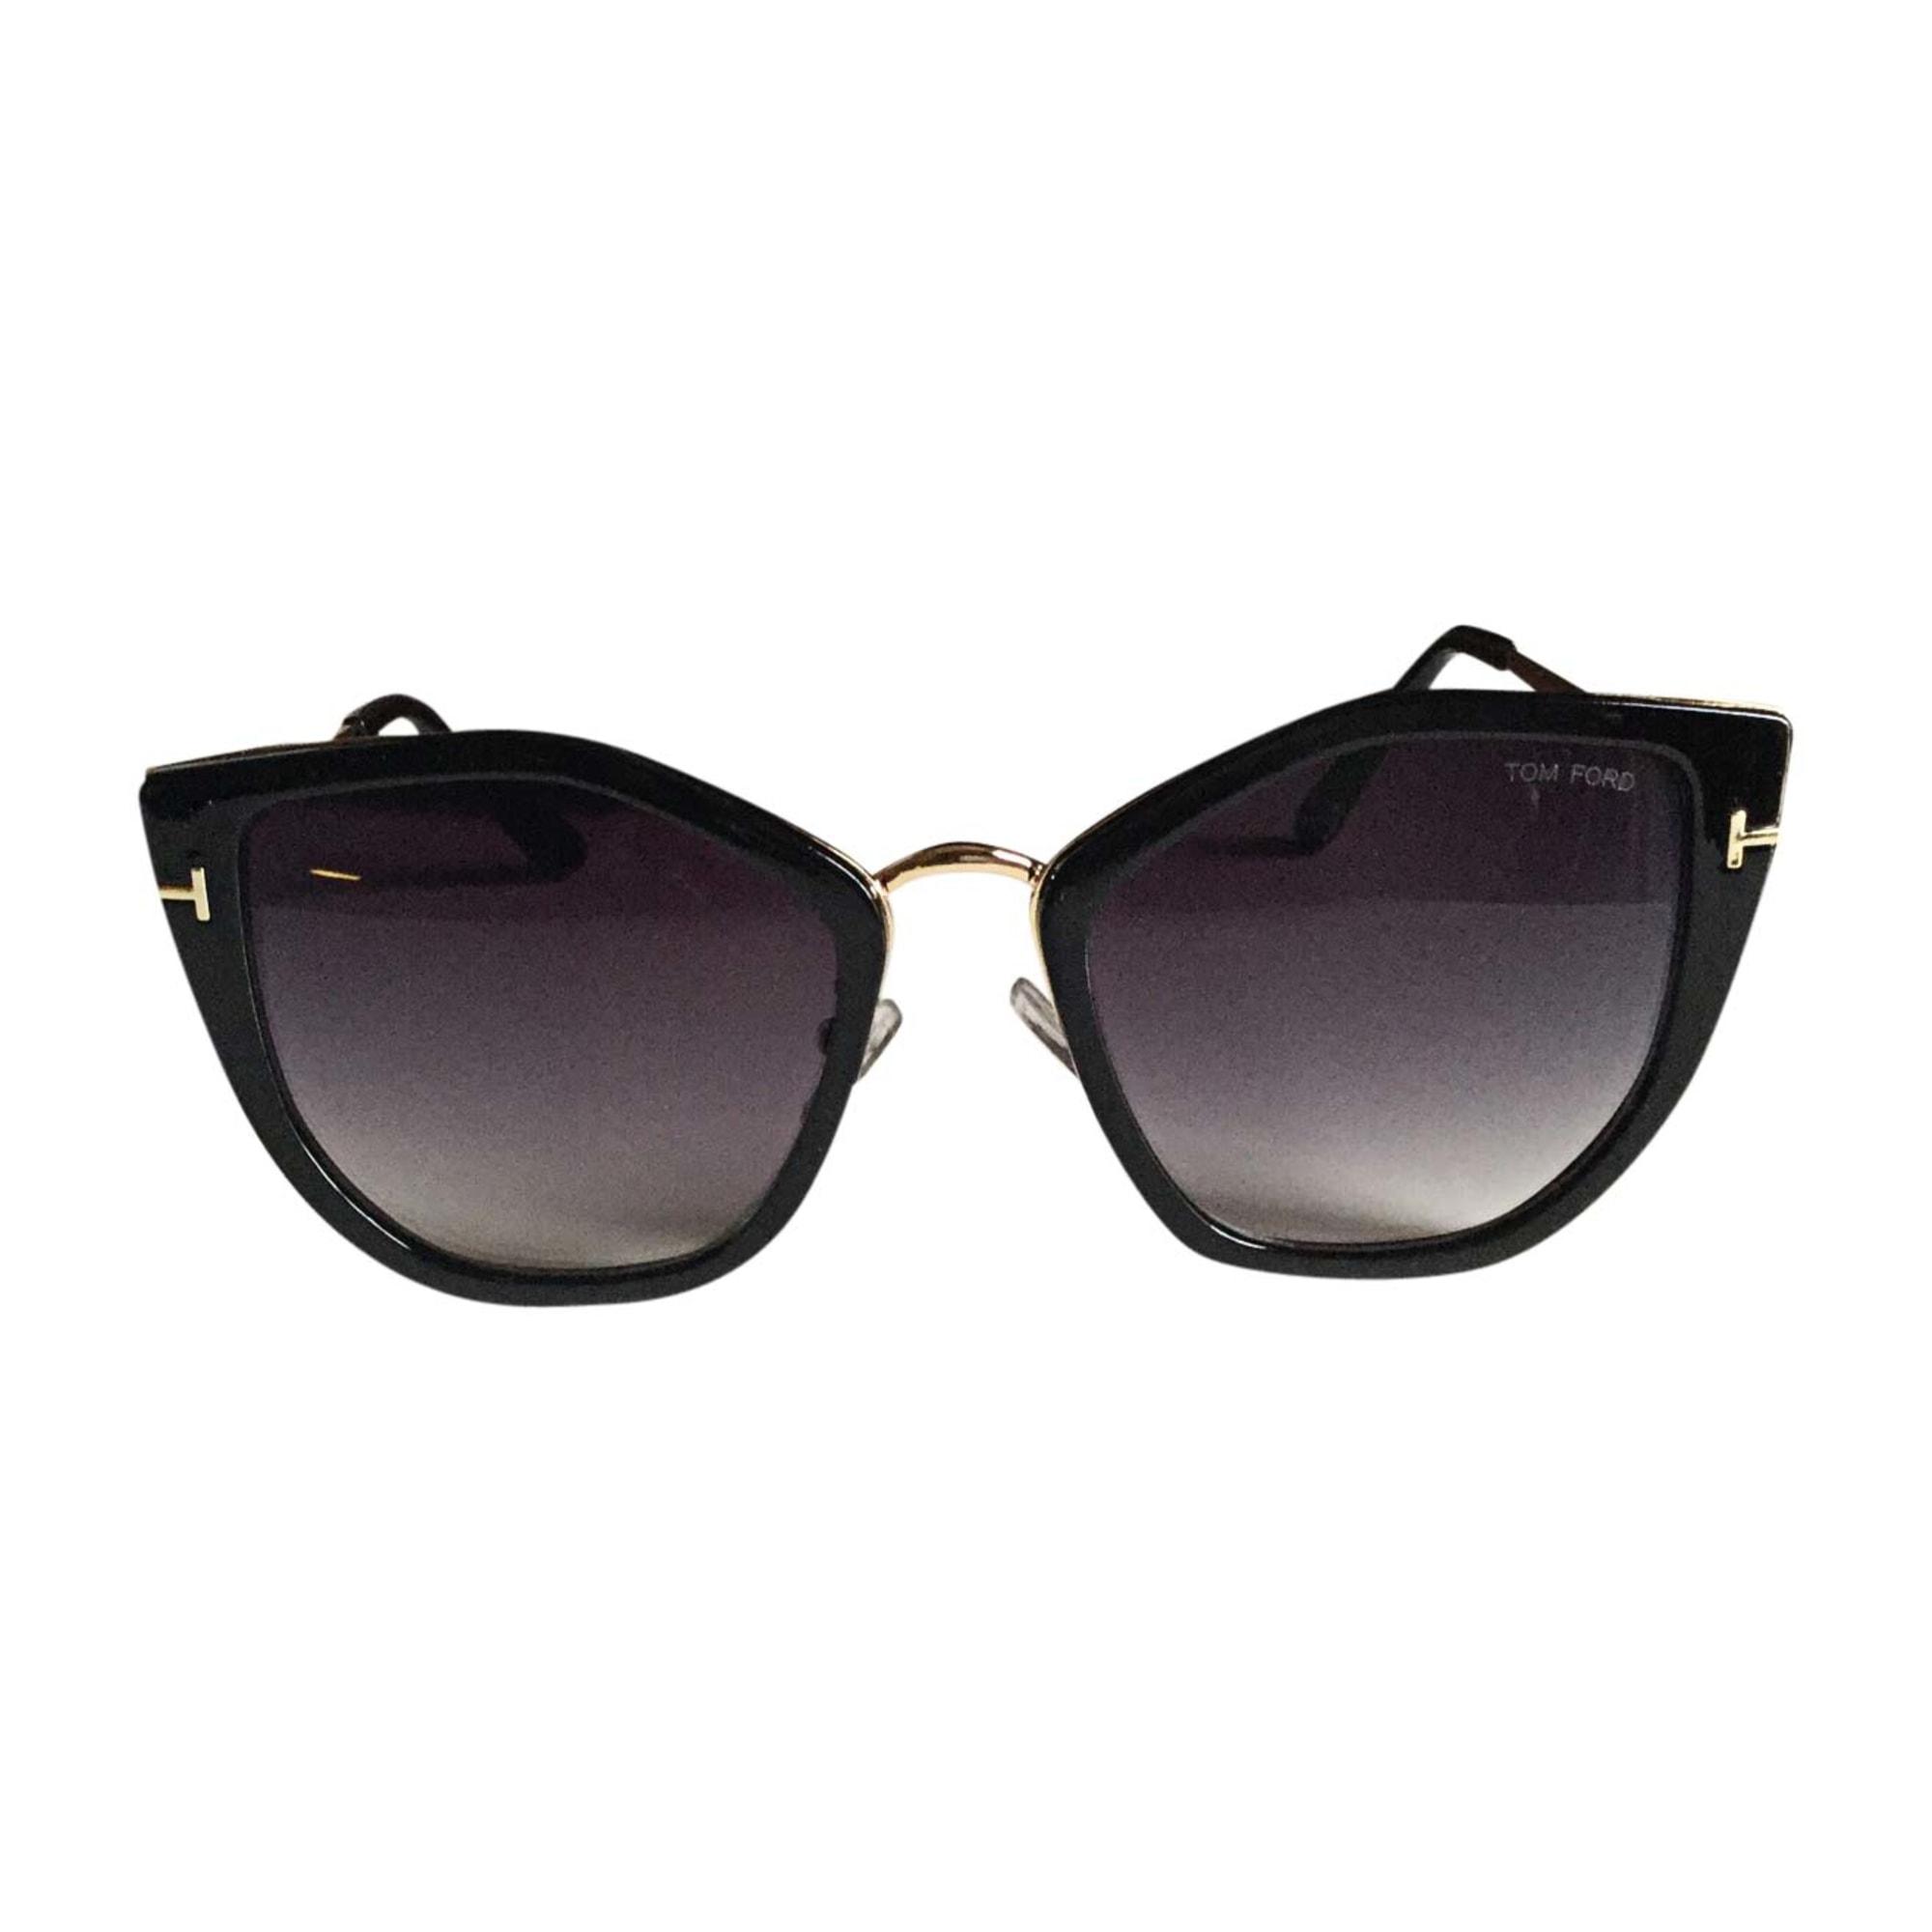 Sunglasses TOM FORD Black